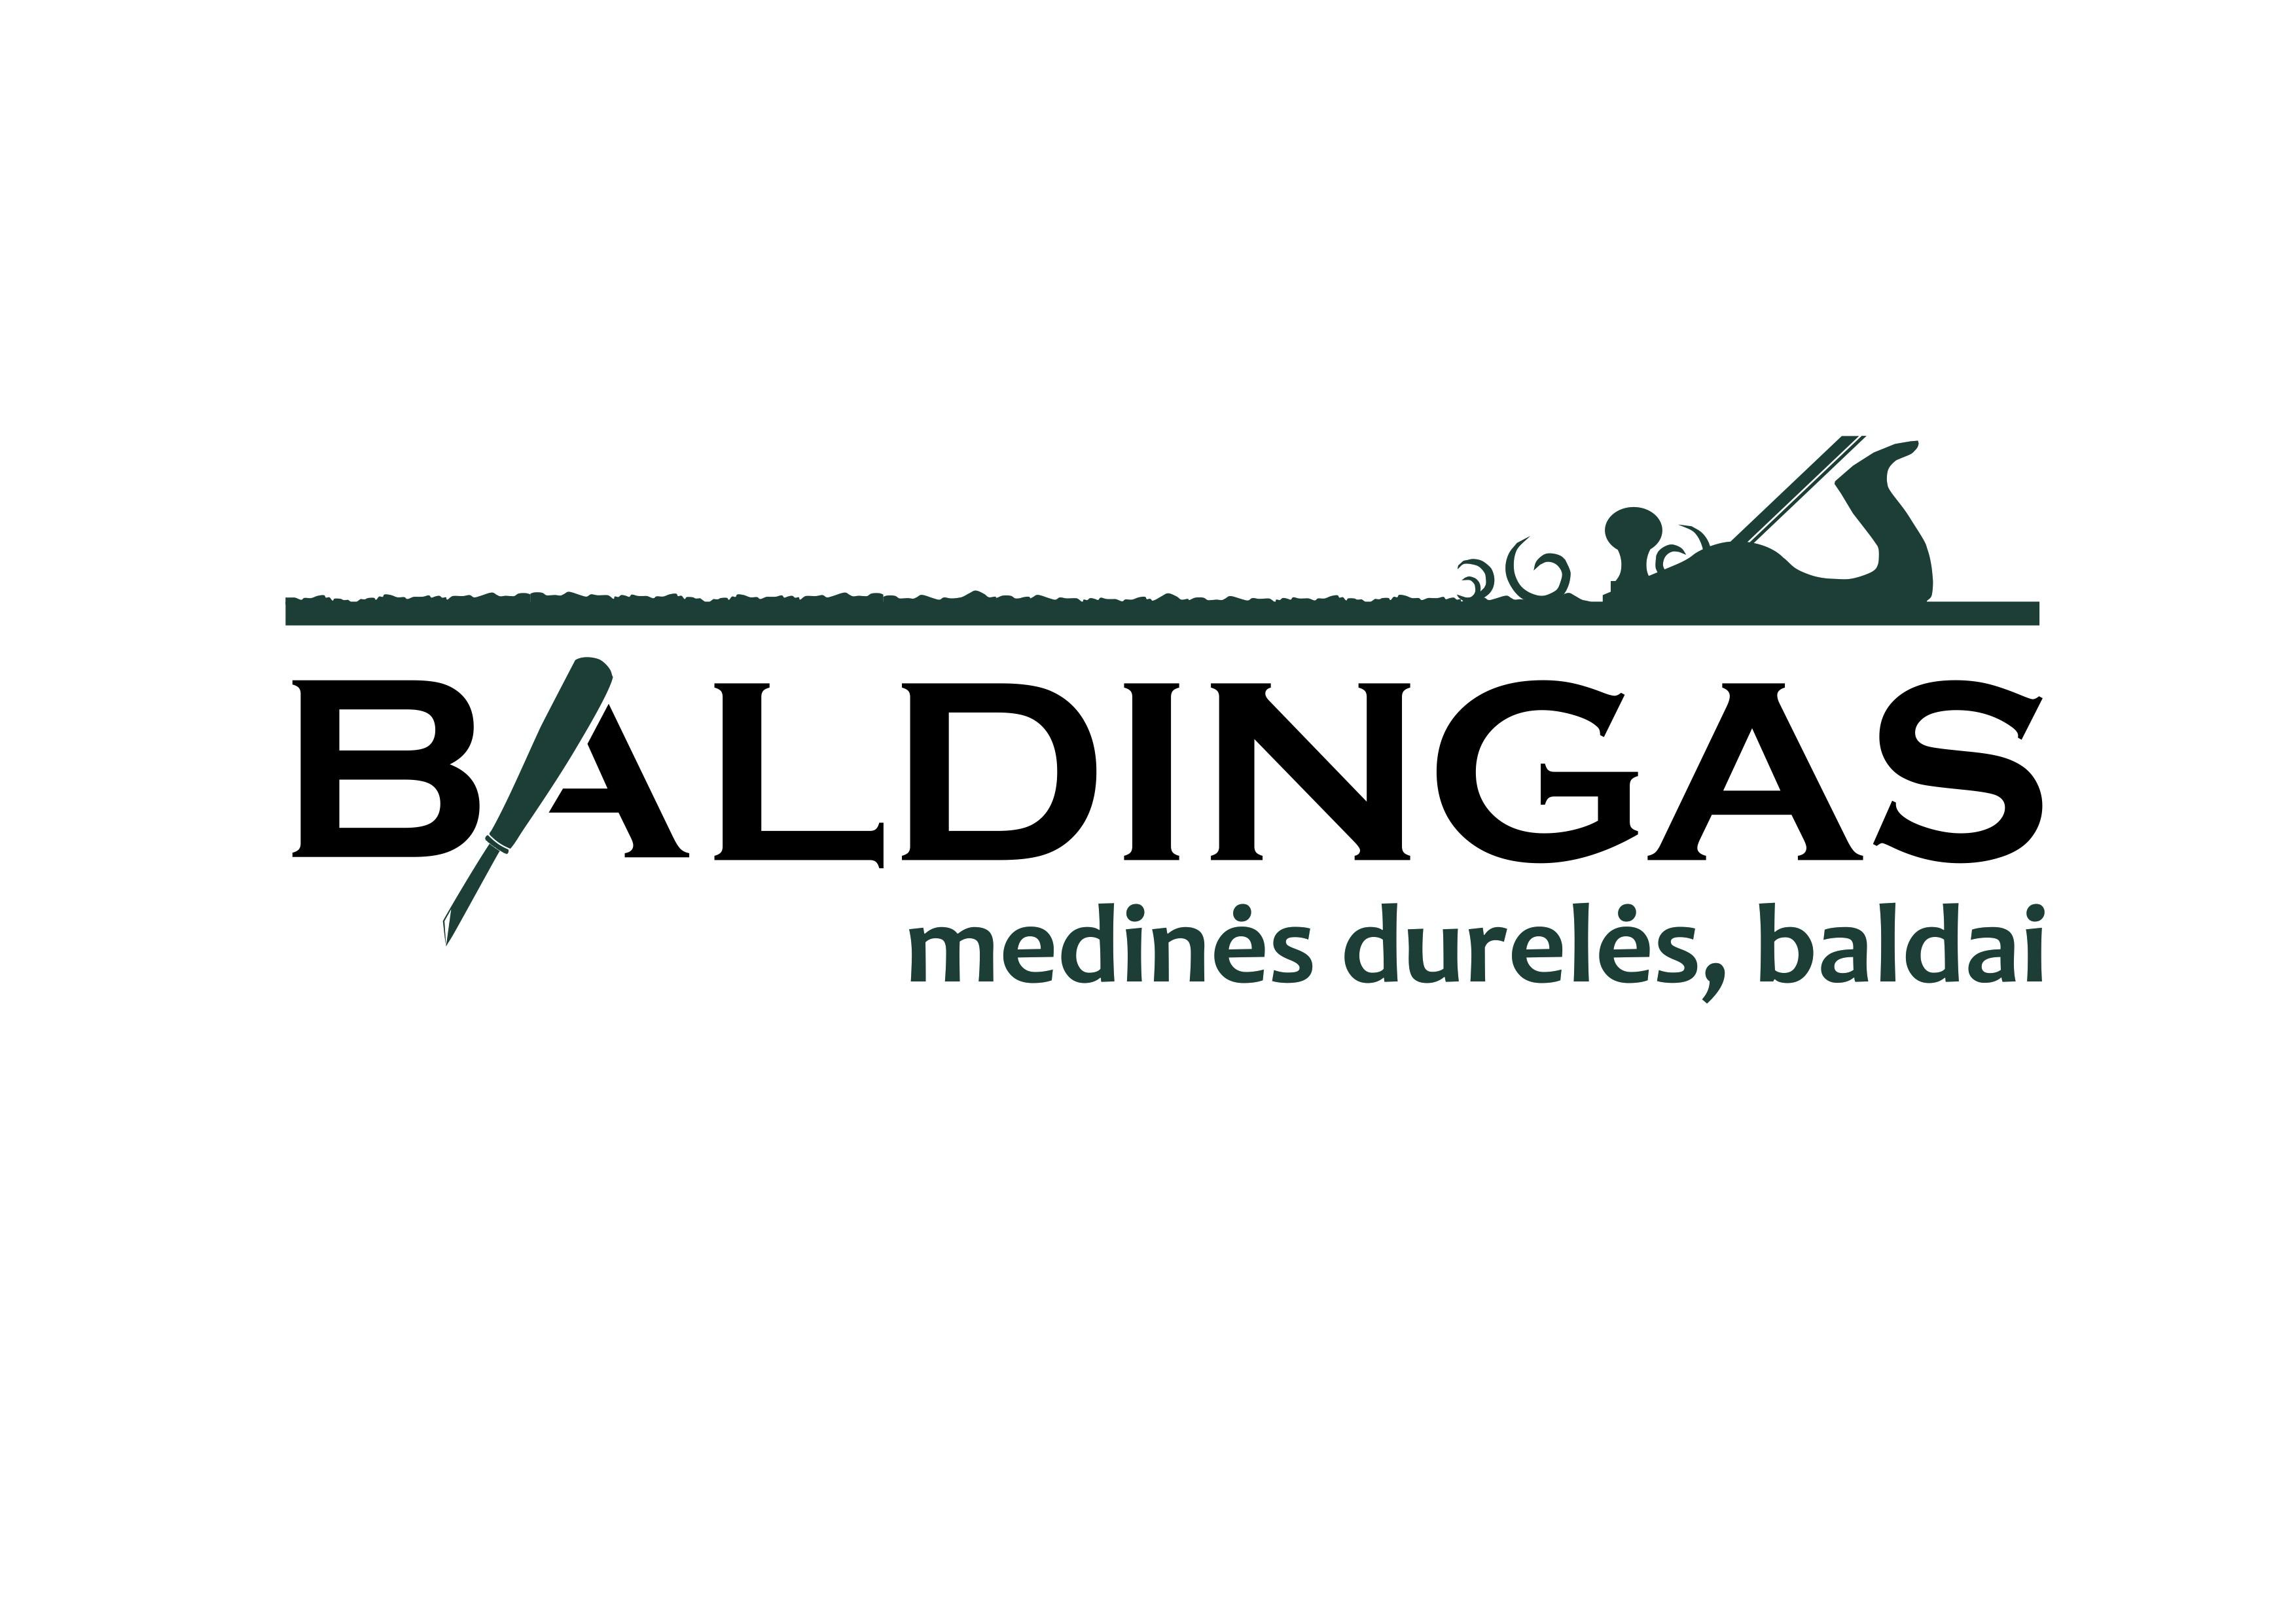 Baldingas